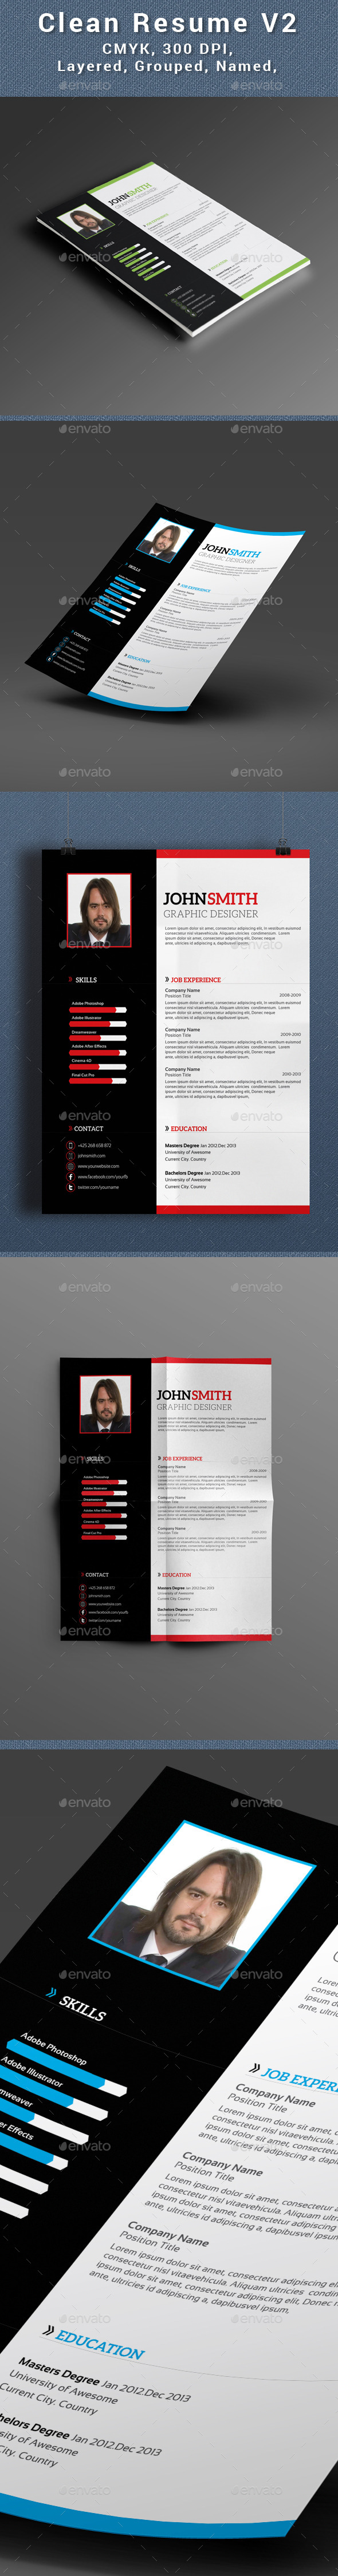 Clean Resume V2